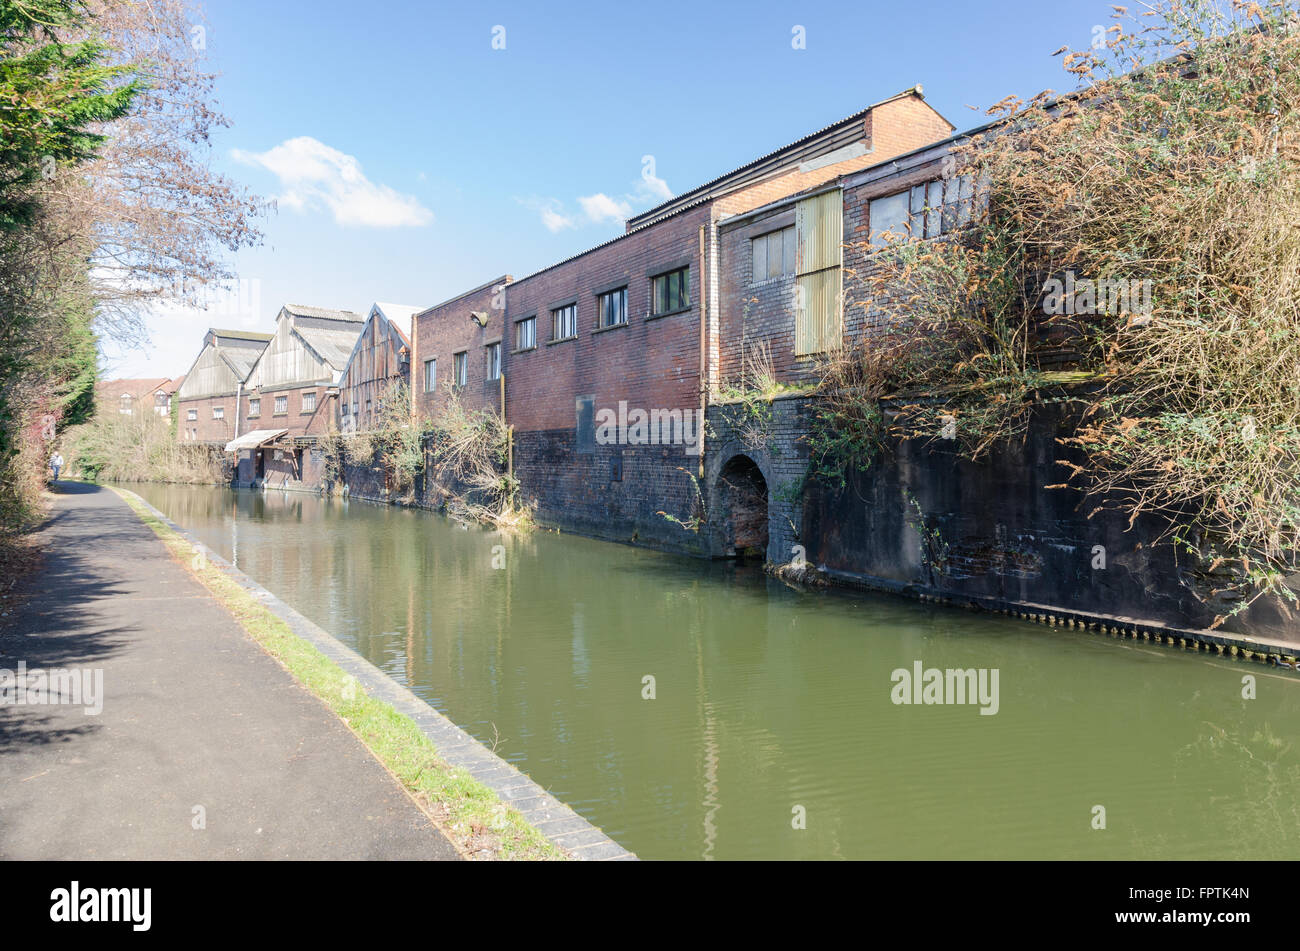 Stourbridge Canal towpath in Stourbridge, Dudley, West Midlands - Stock Image